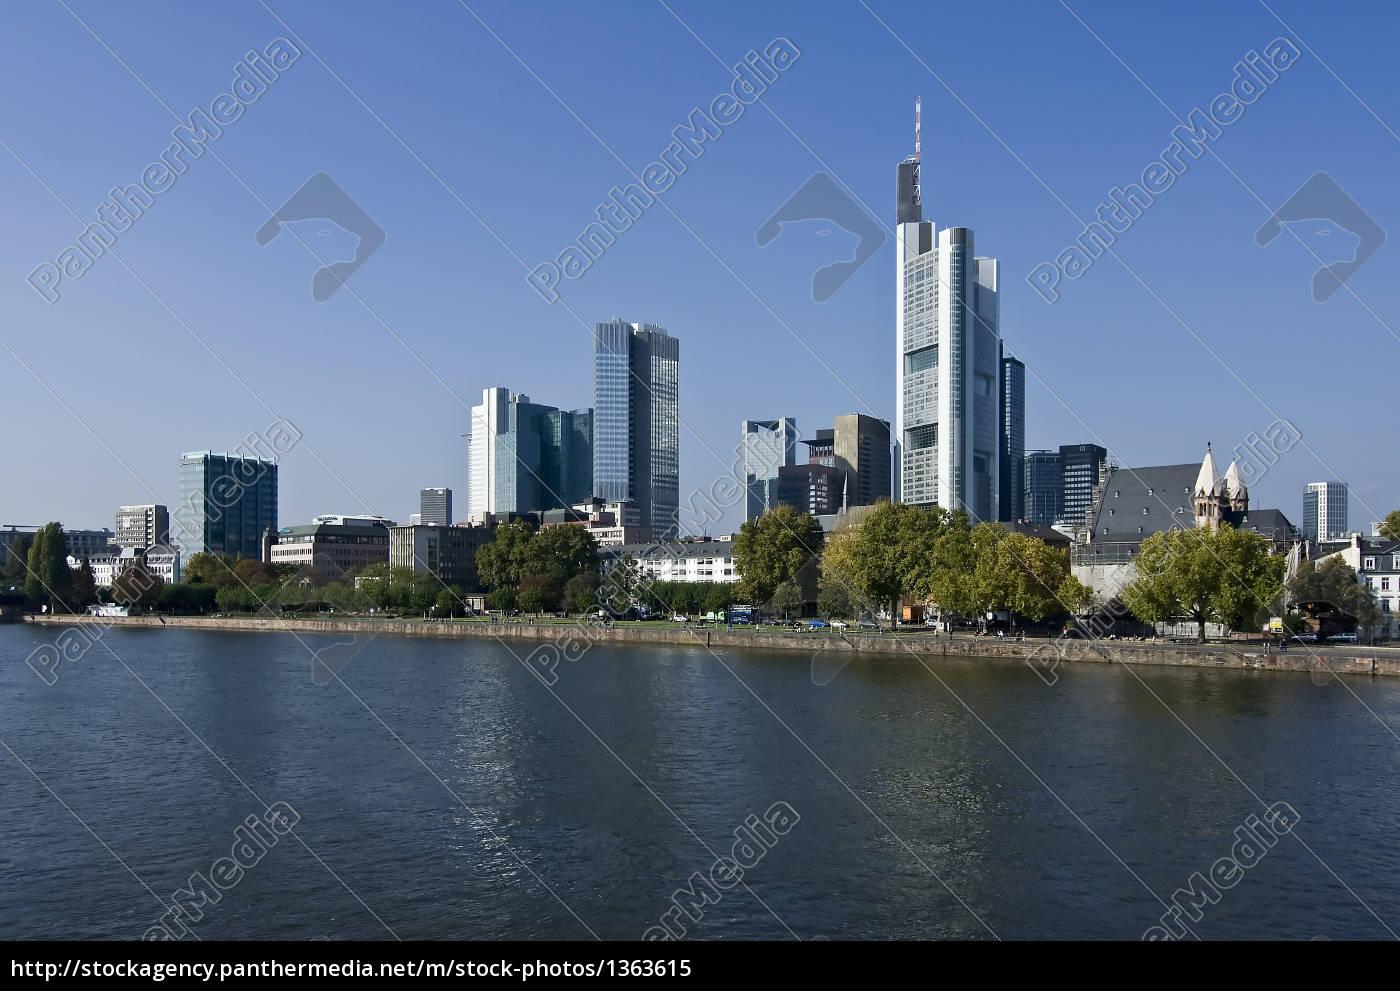 frankfurt, am, main - 1363615